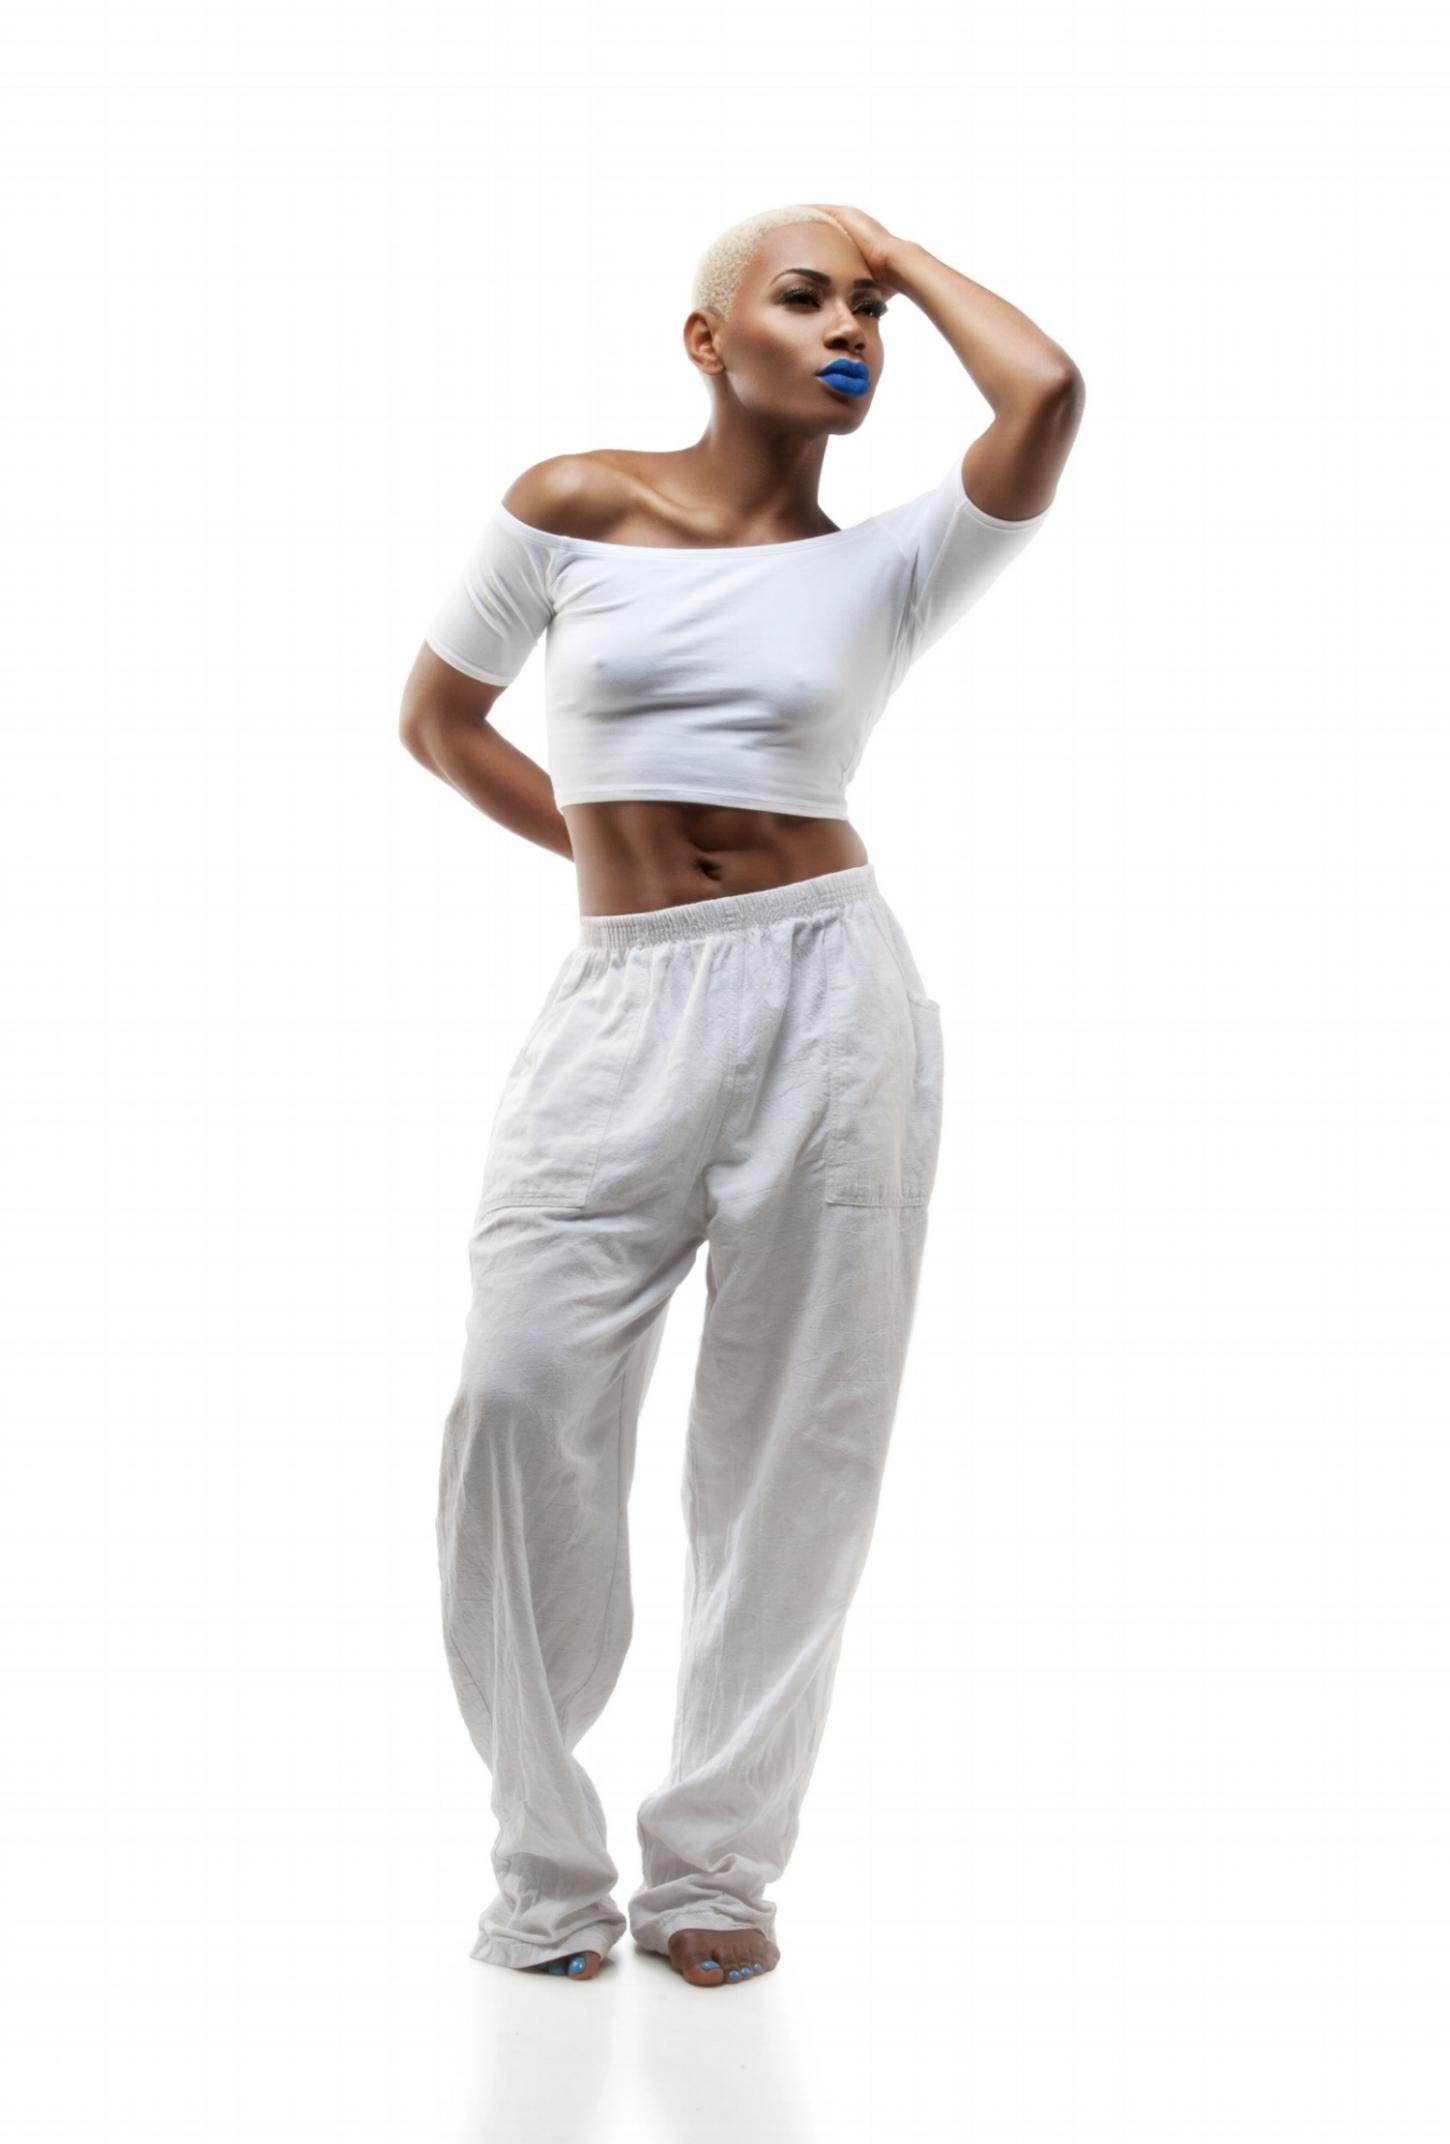 Ezinne Asinugo of CEO Dancers